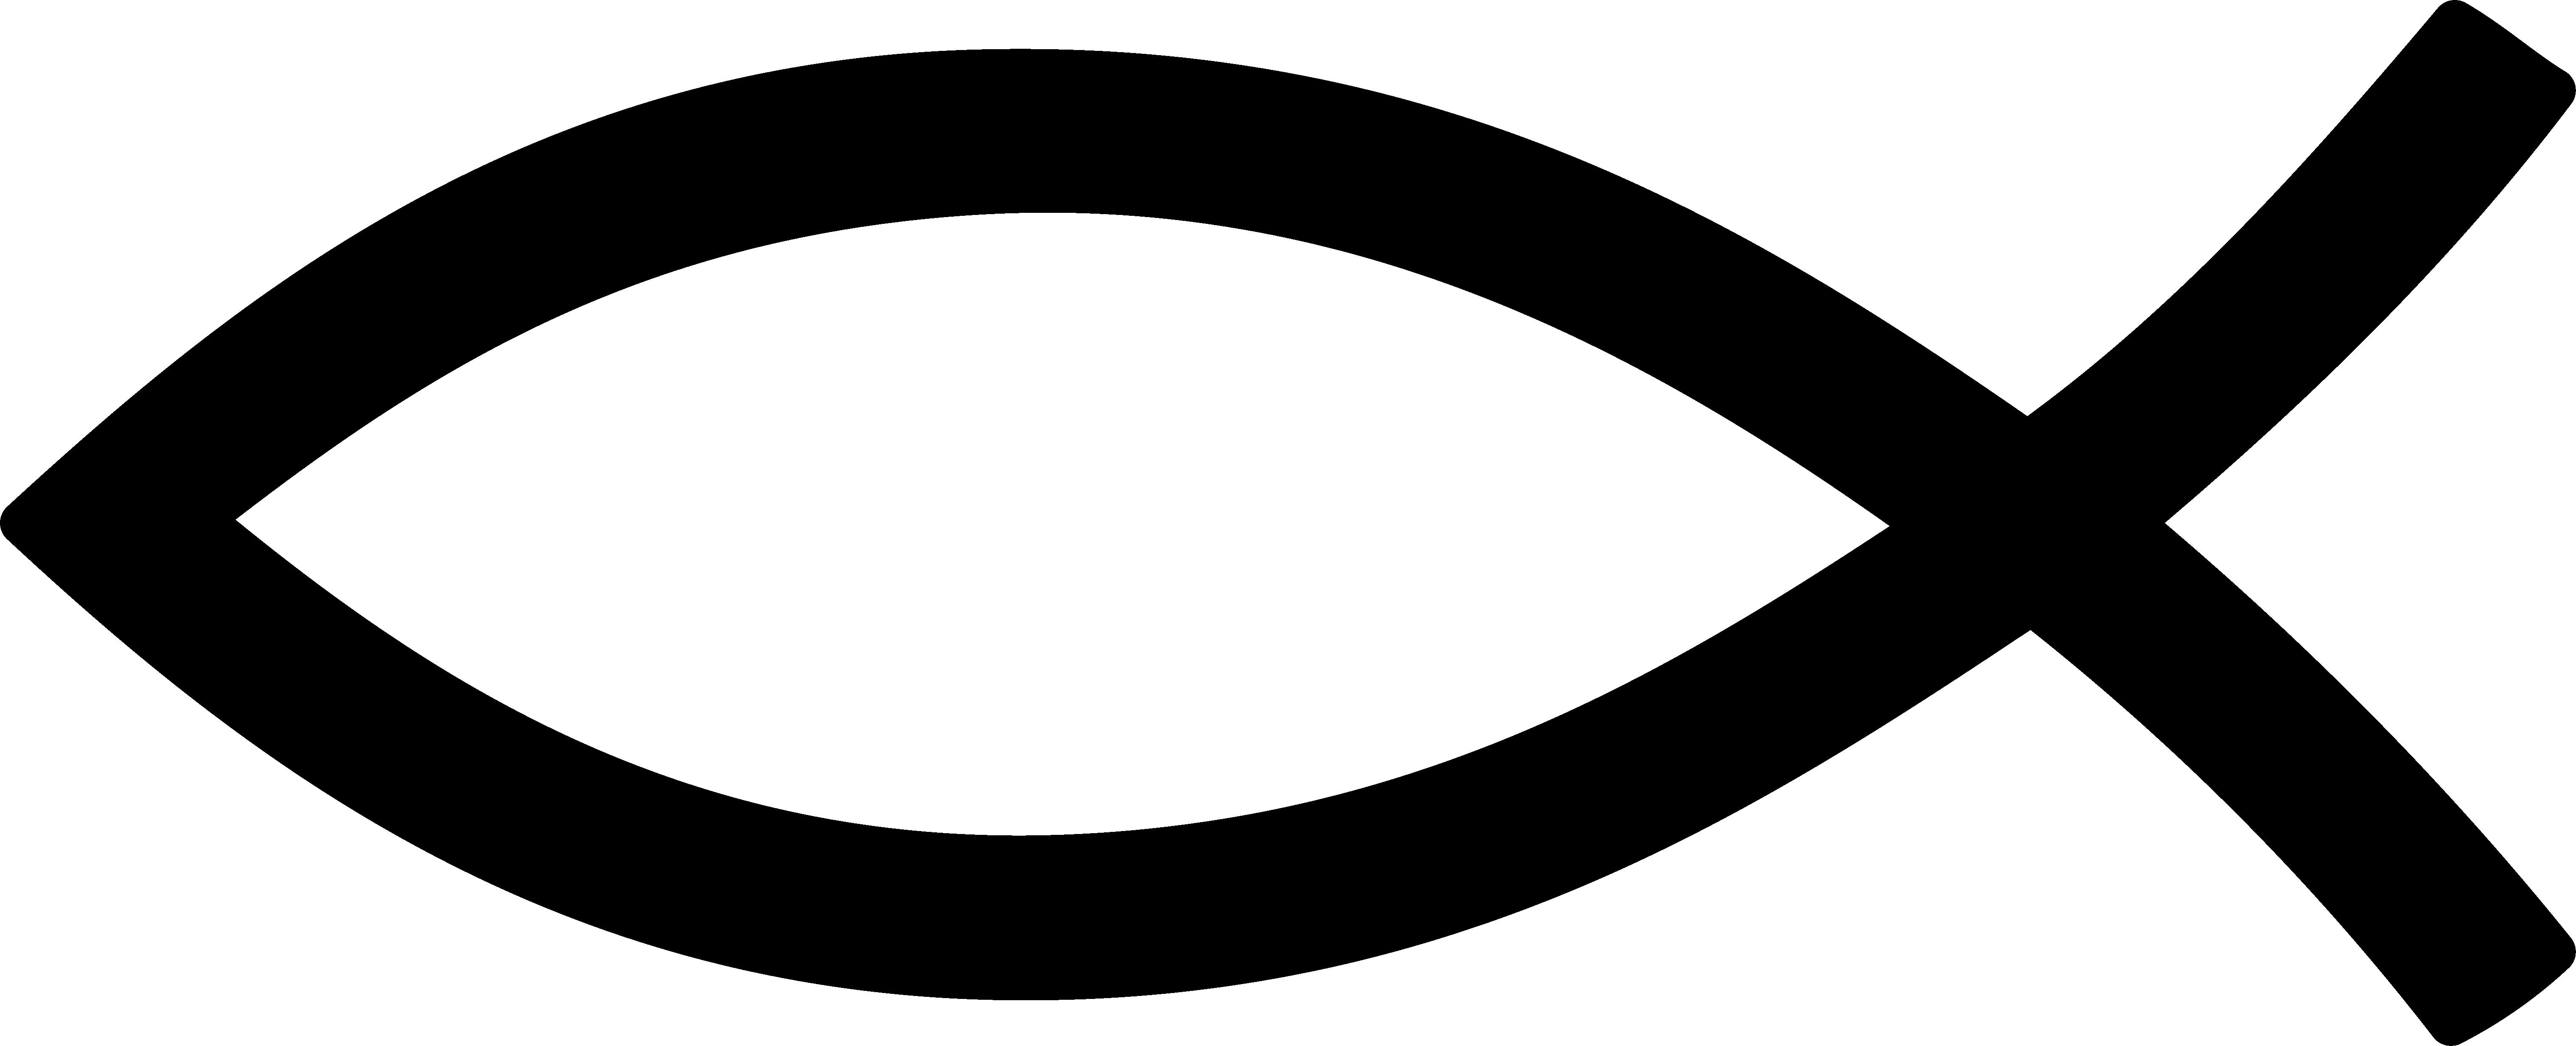 Christian Fish Symbol Black Png 6075 2467